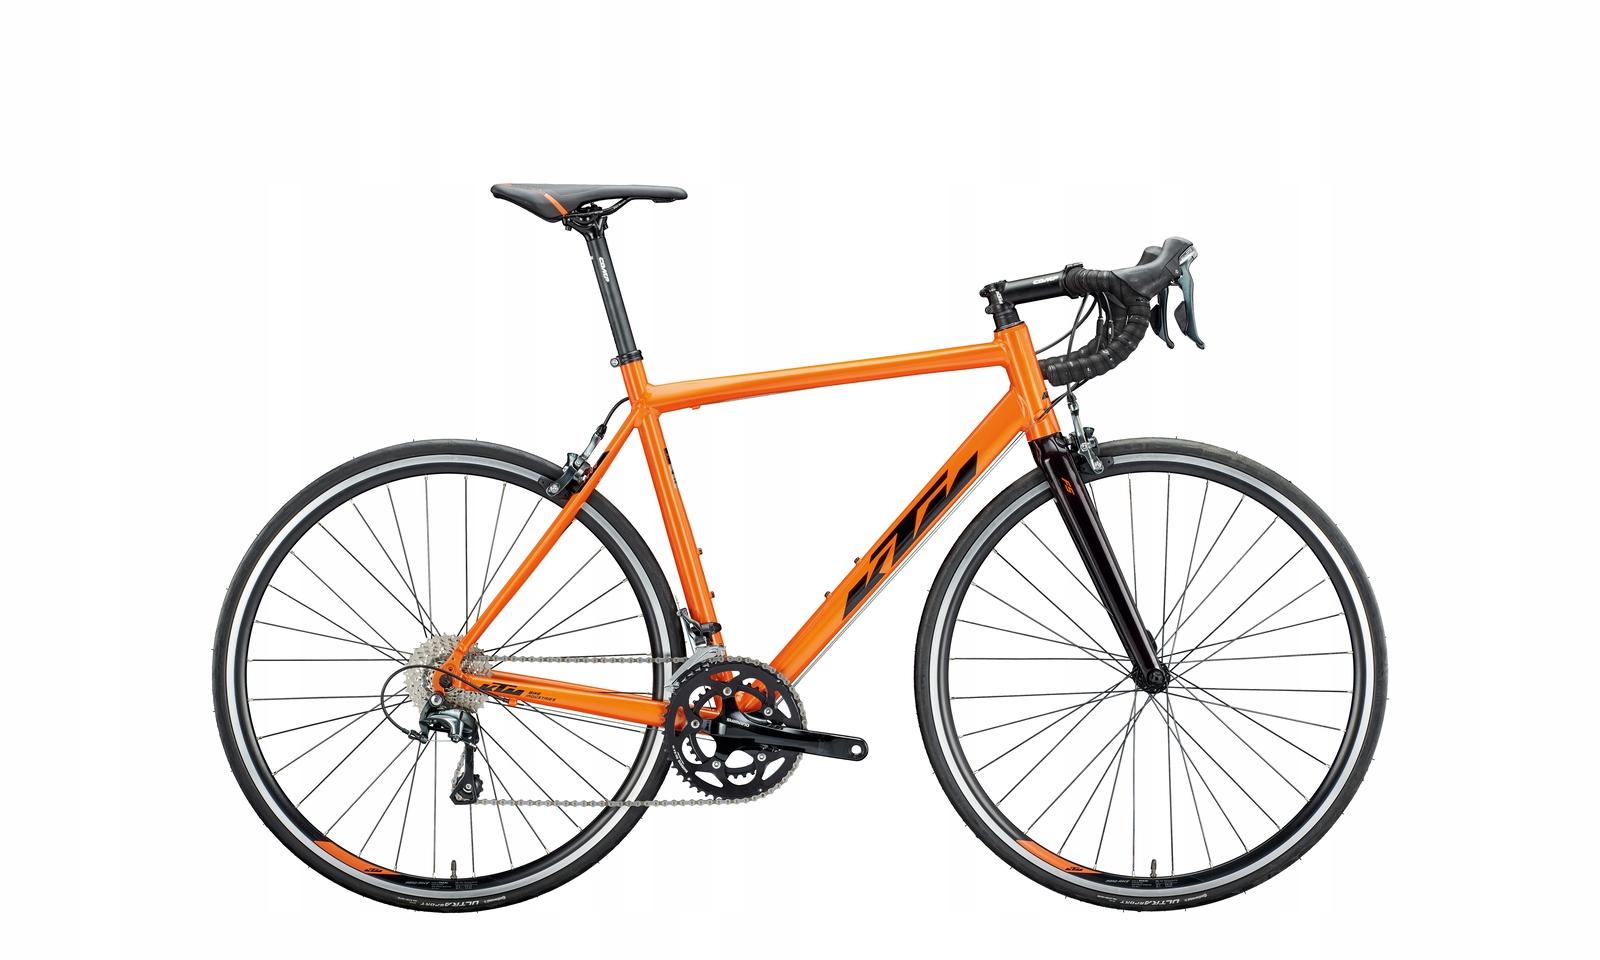 Bicykel KTM Strada 1000 55 cm oranžová